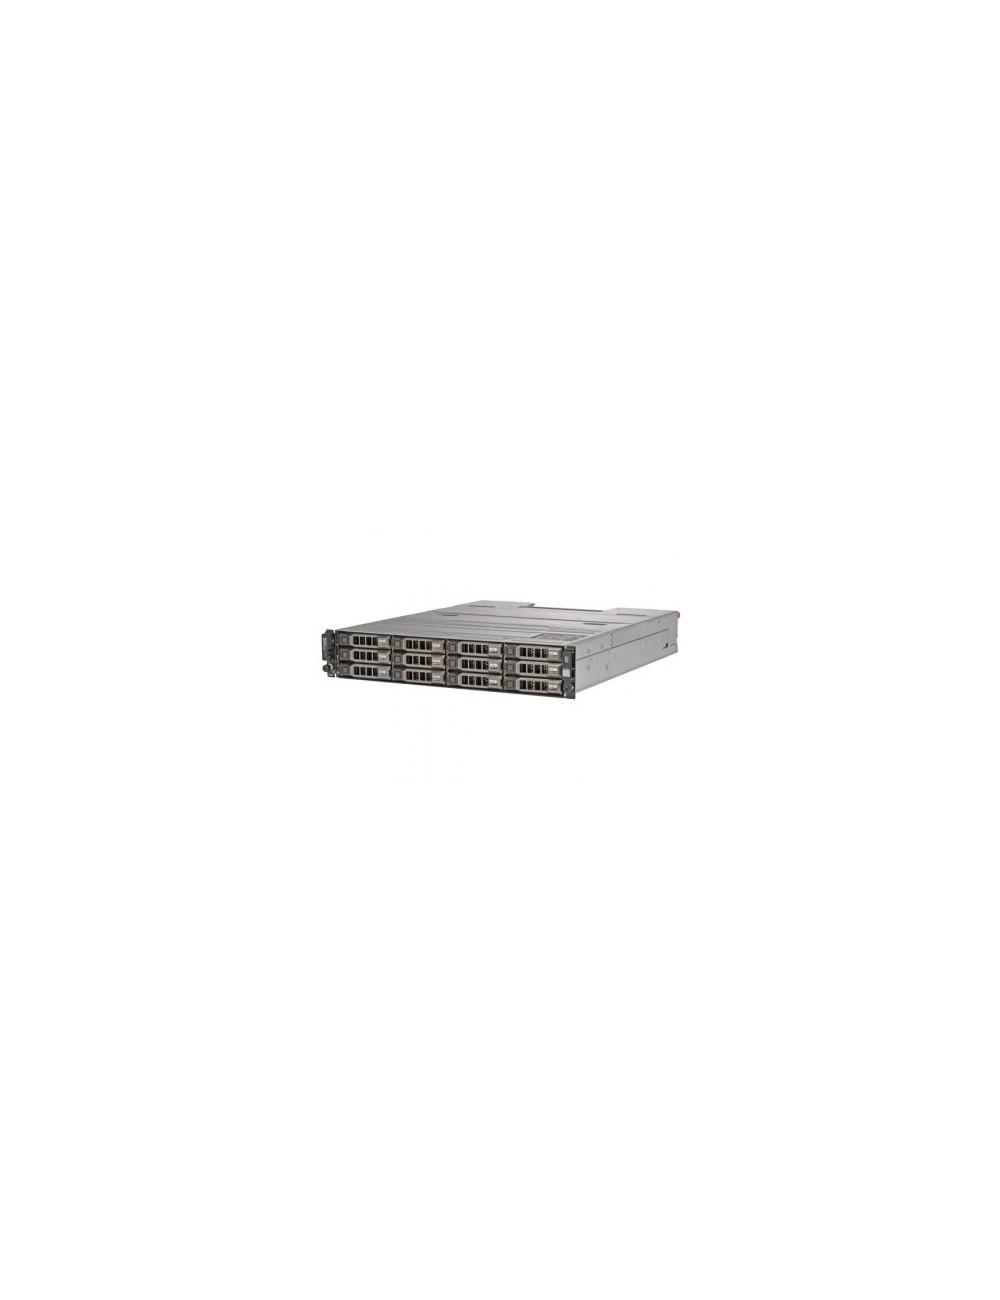 Dell PowerVault MD1200 + 3x 3TB 7.2K SAS HDD